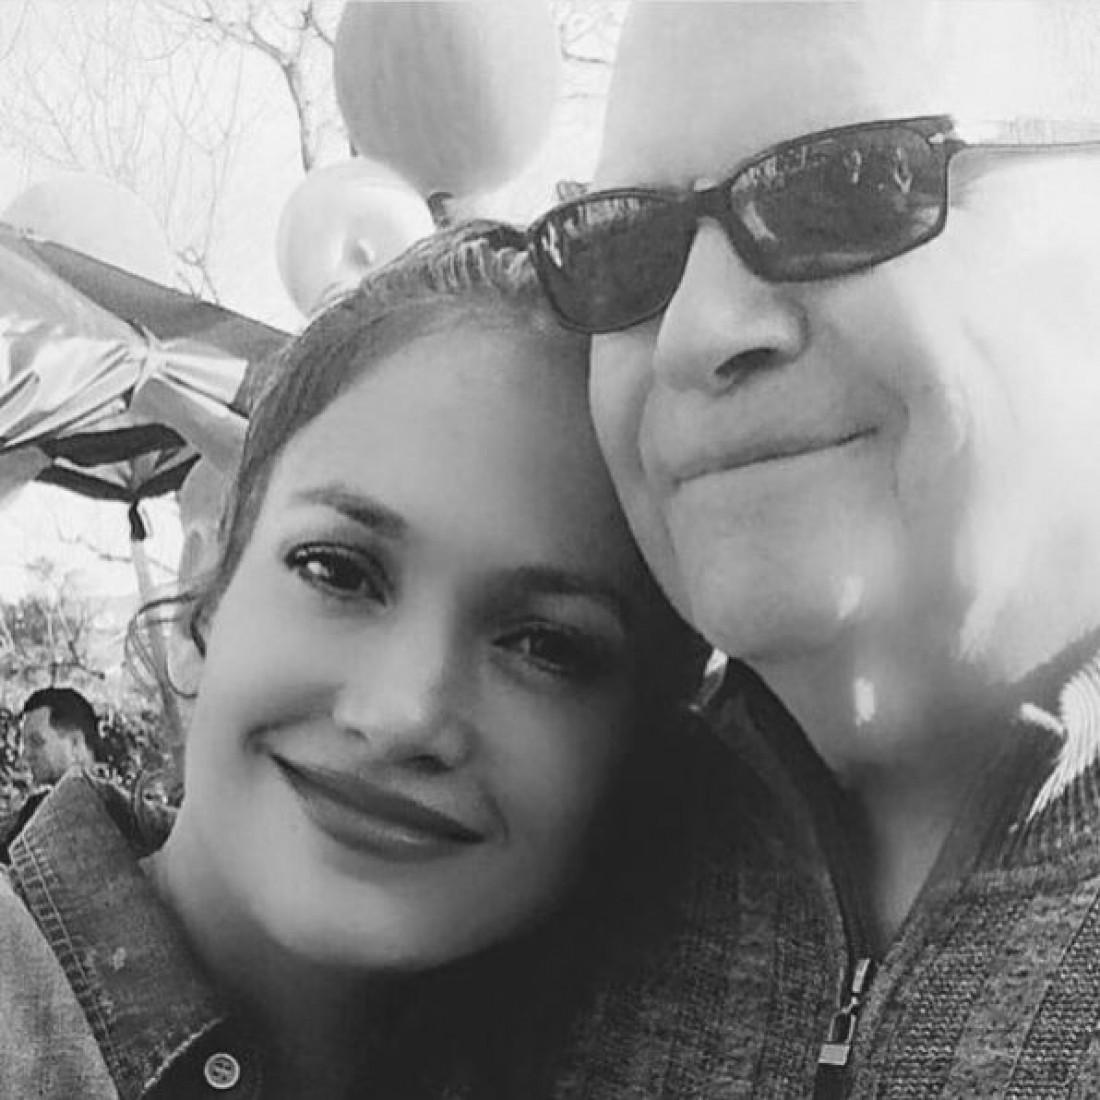 Дженнифер Лопес со своим отцом